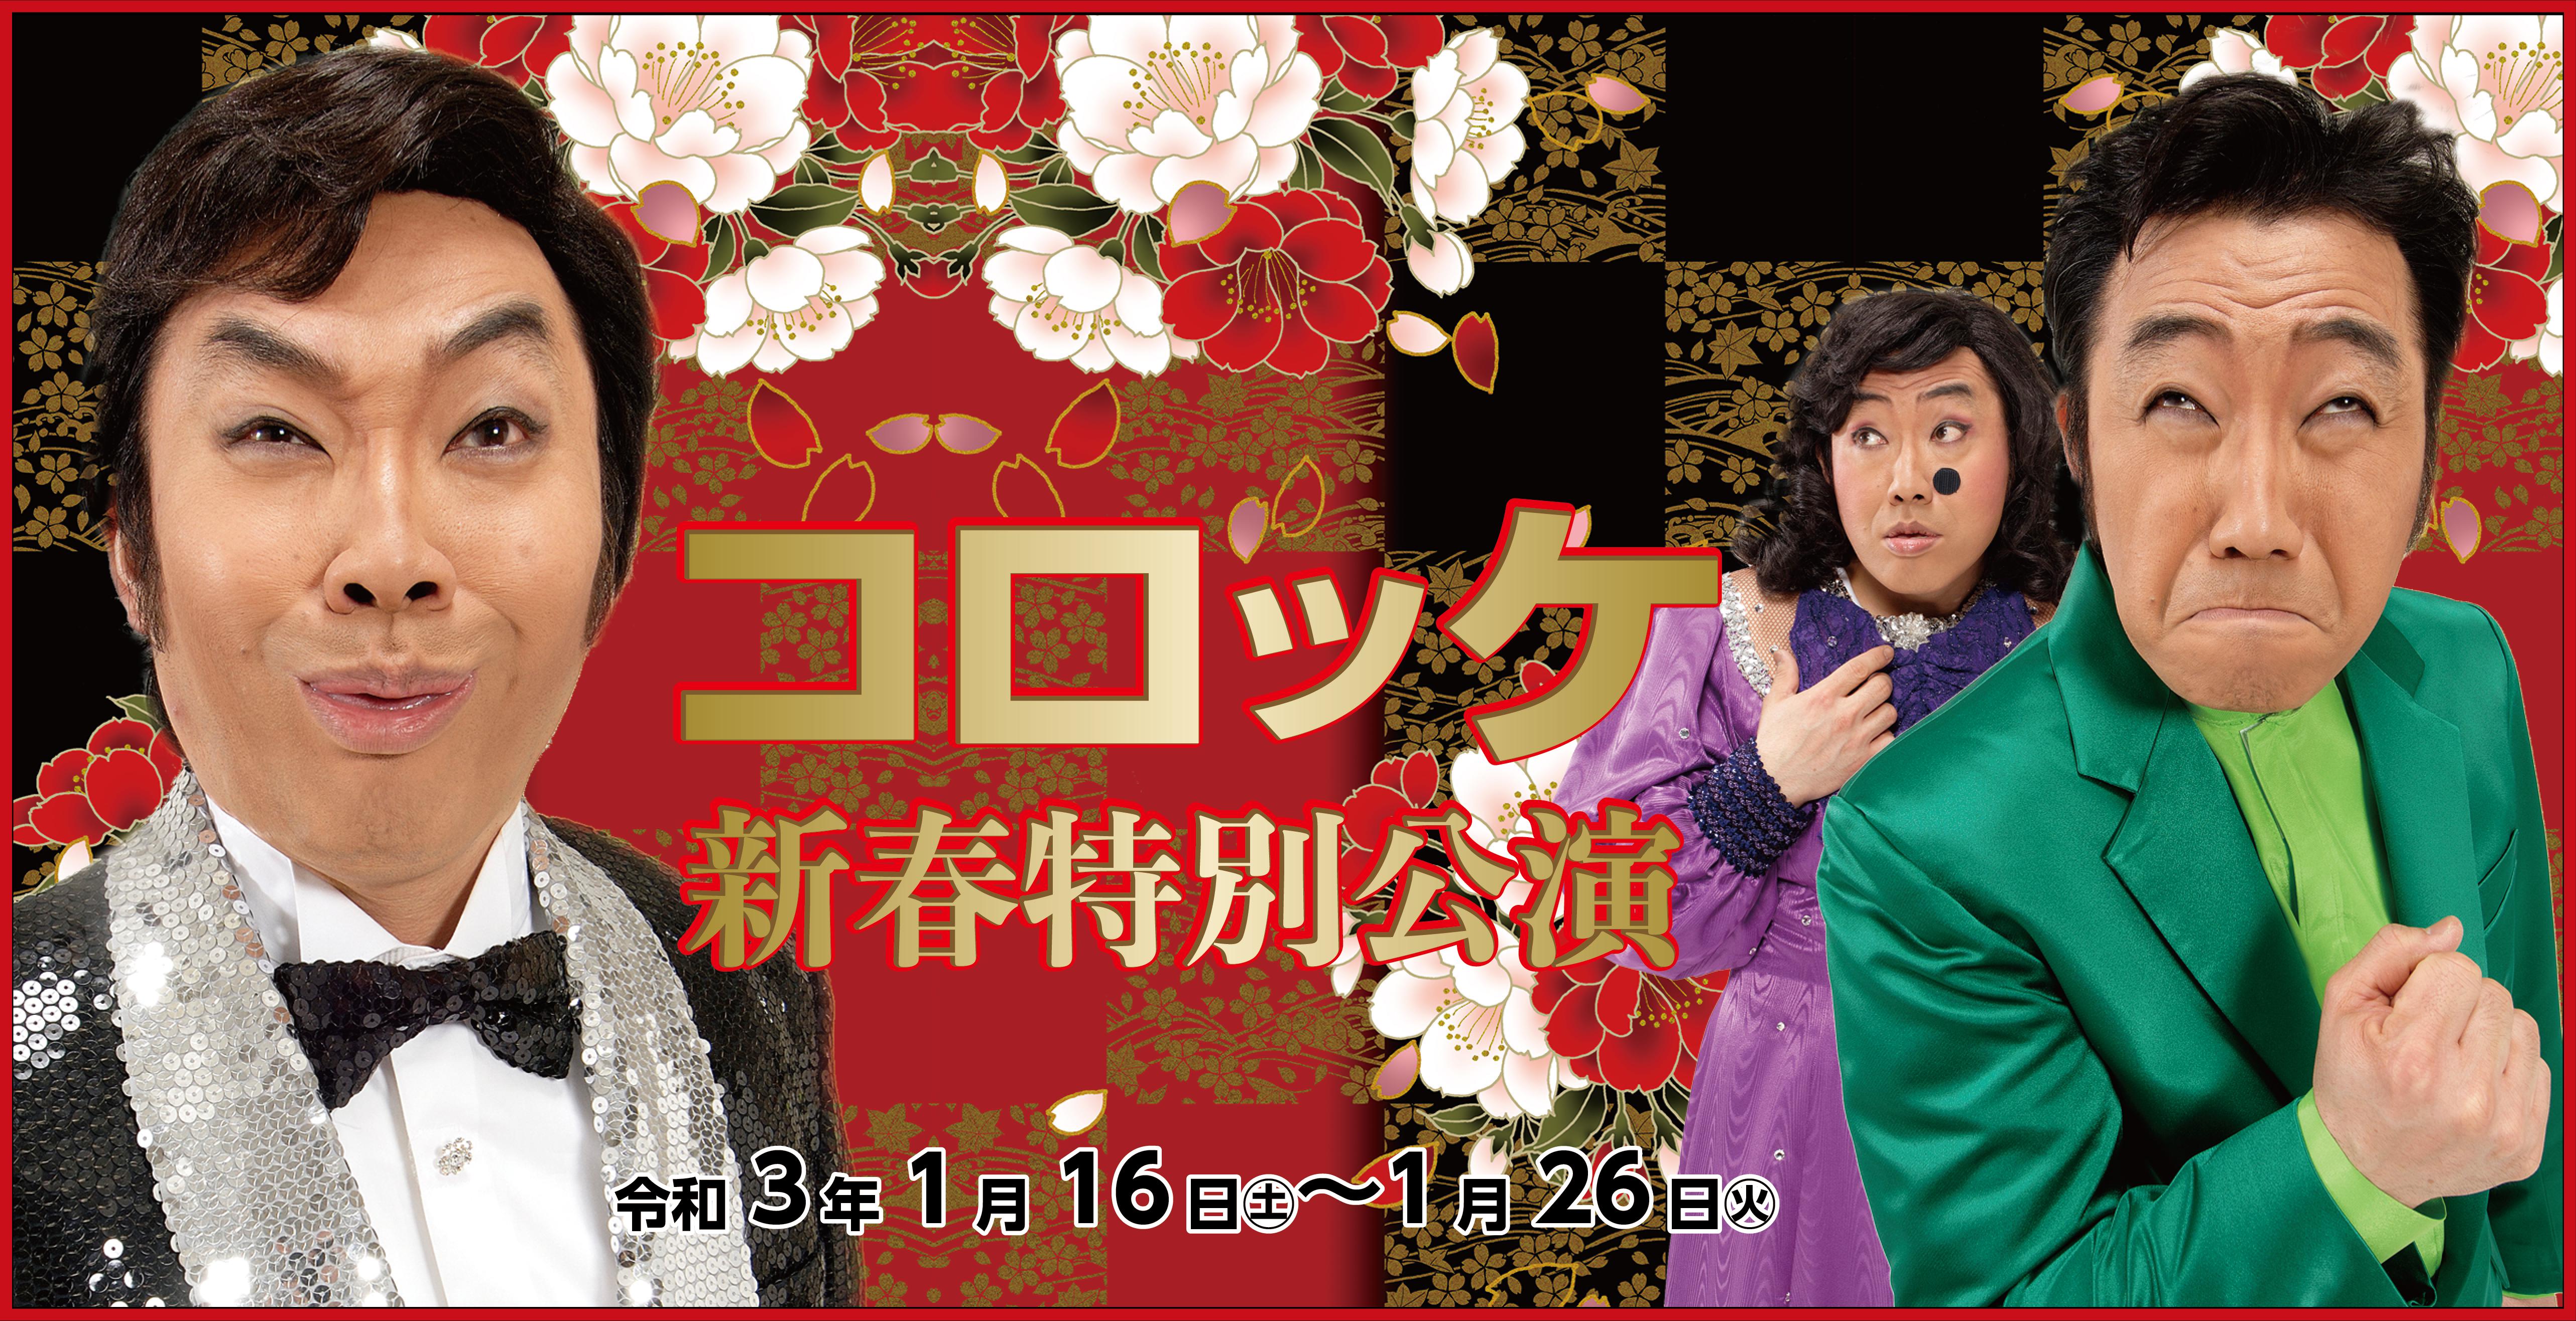 芸能生活40周年記念 コロッケ新春特別公演